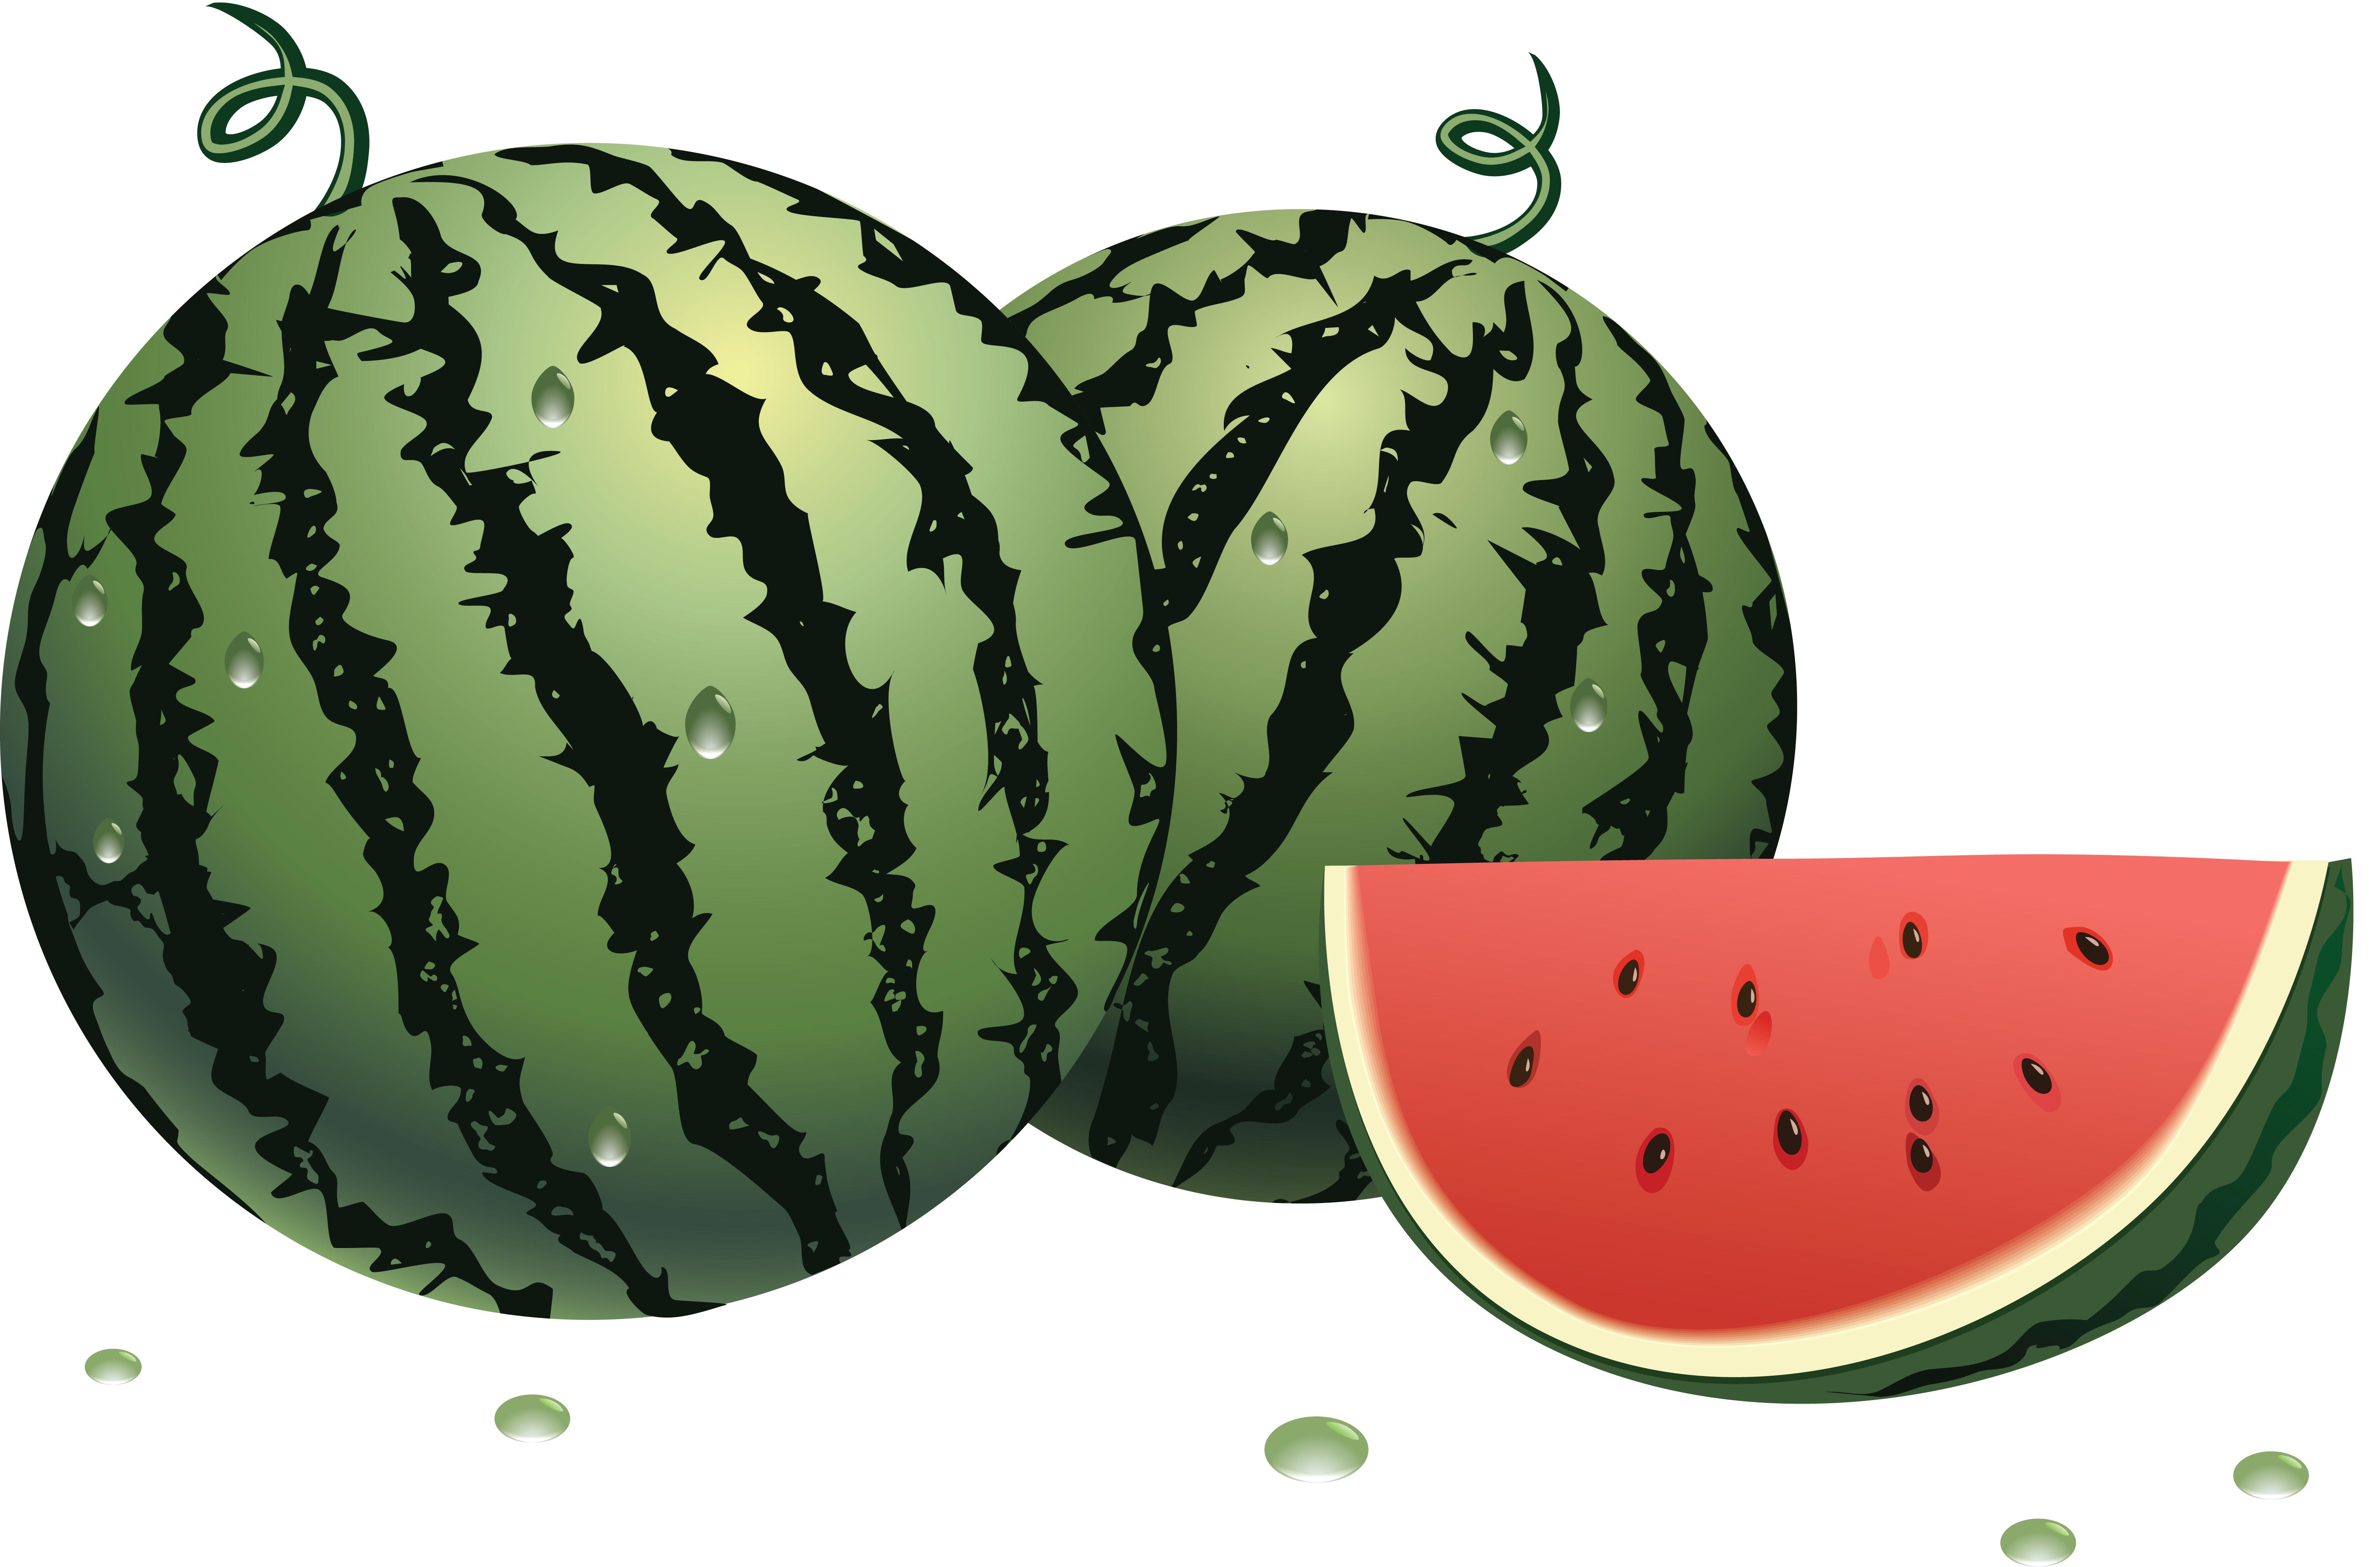 Free image clip art. Watermelon clipart single fruit